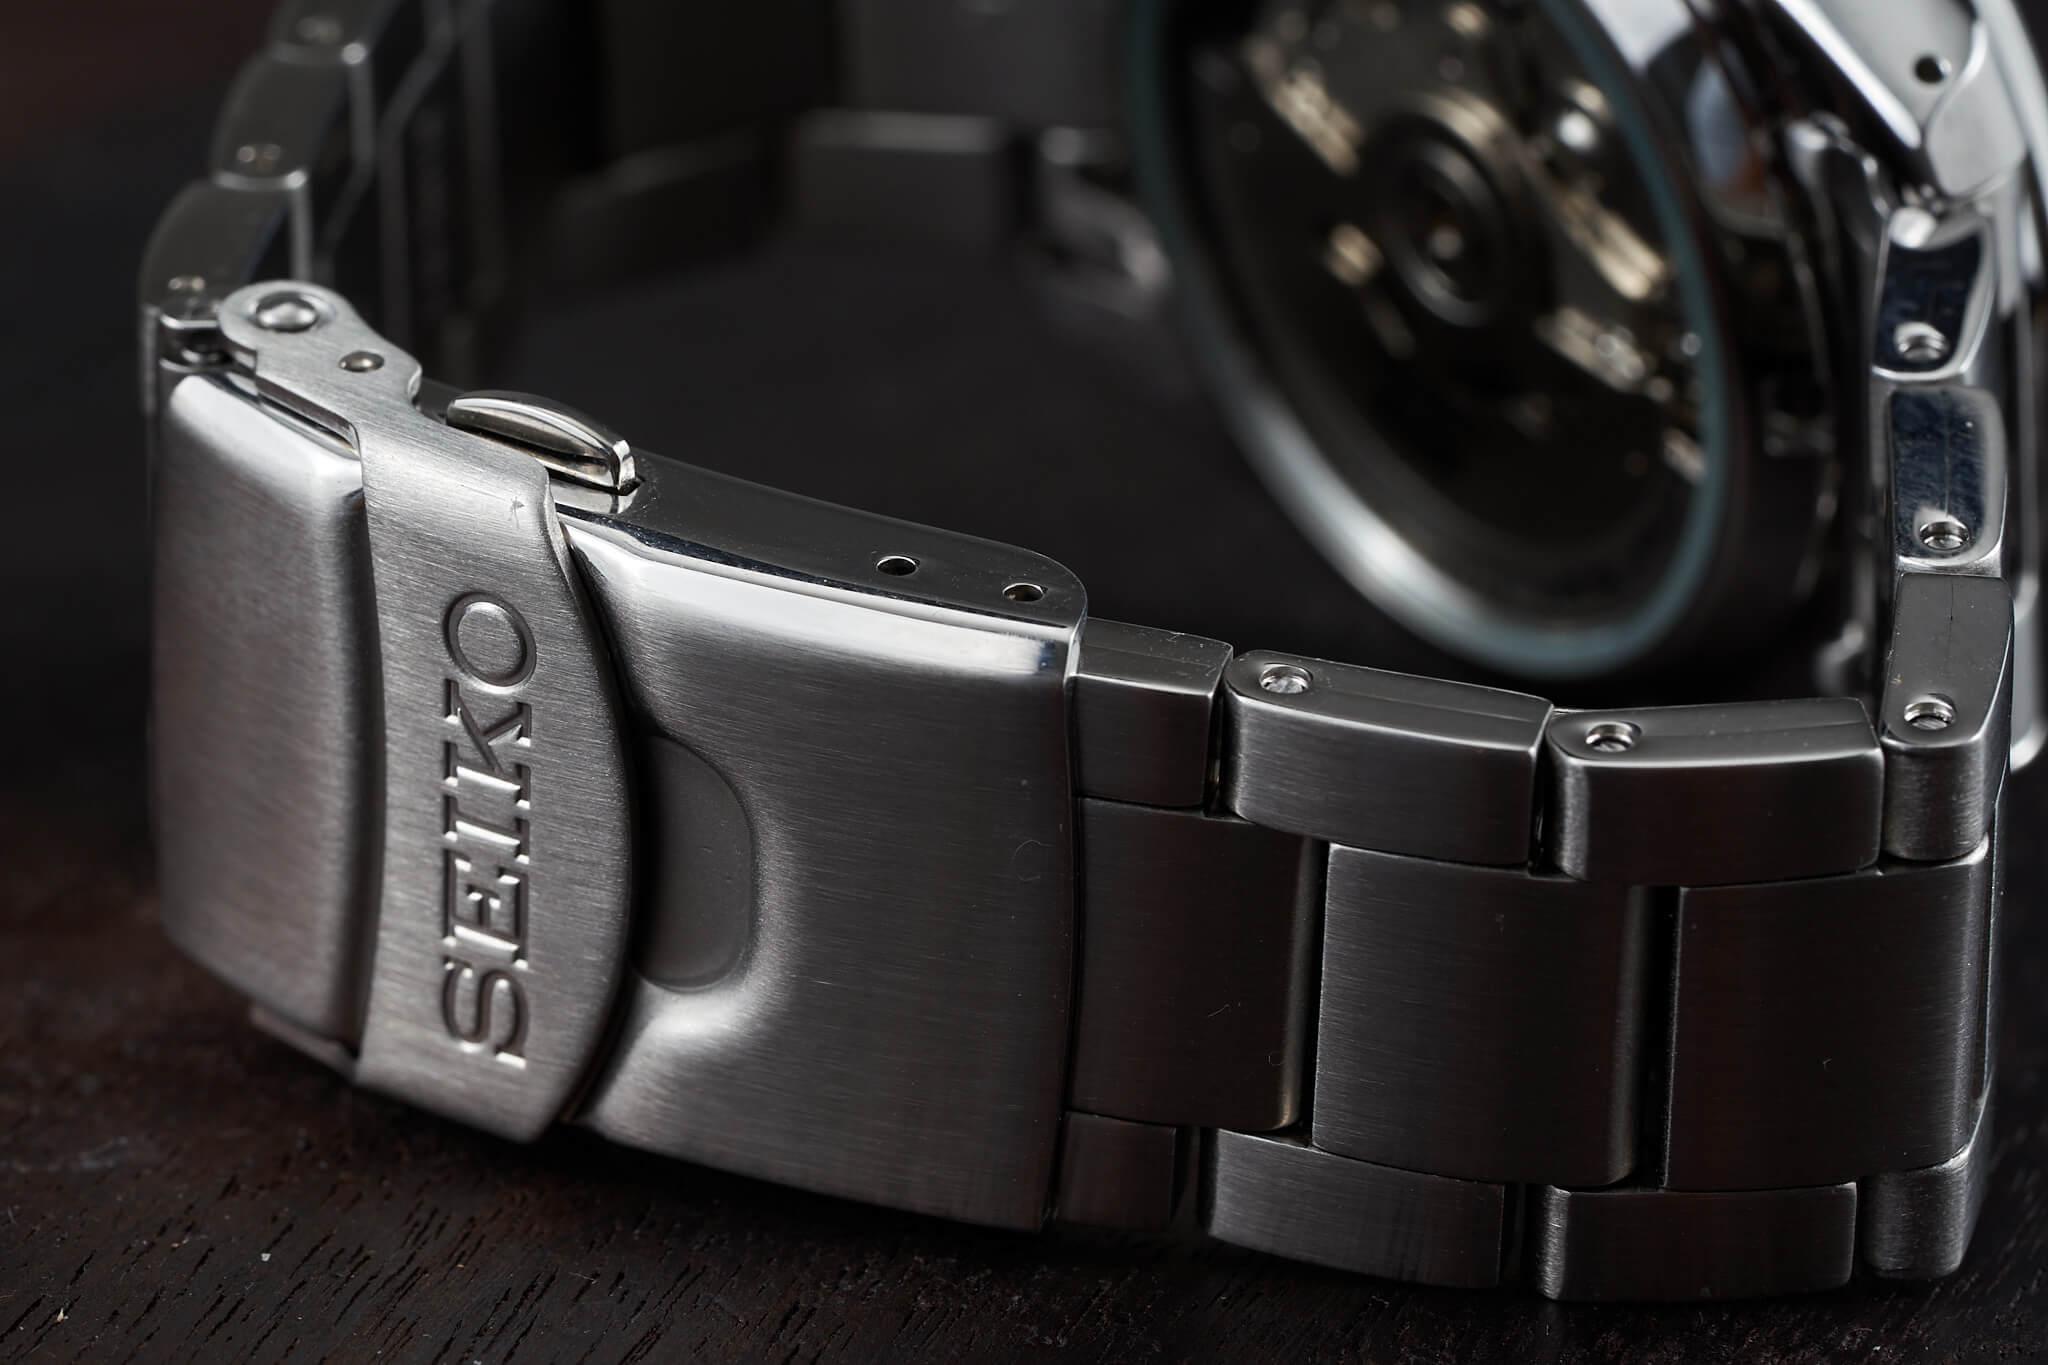 Seiko-5-Fixed-Bezel-SRPE55-SRPE51-SRPE53-SRPE57-12-1